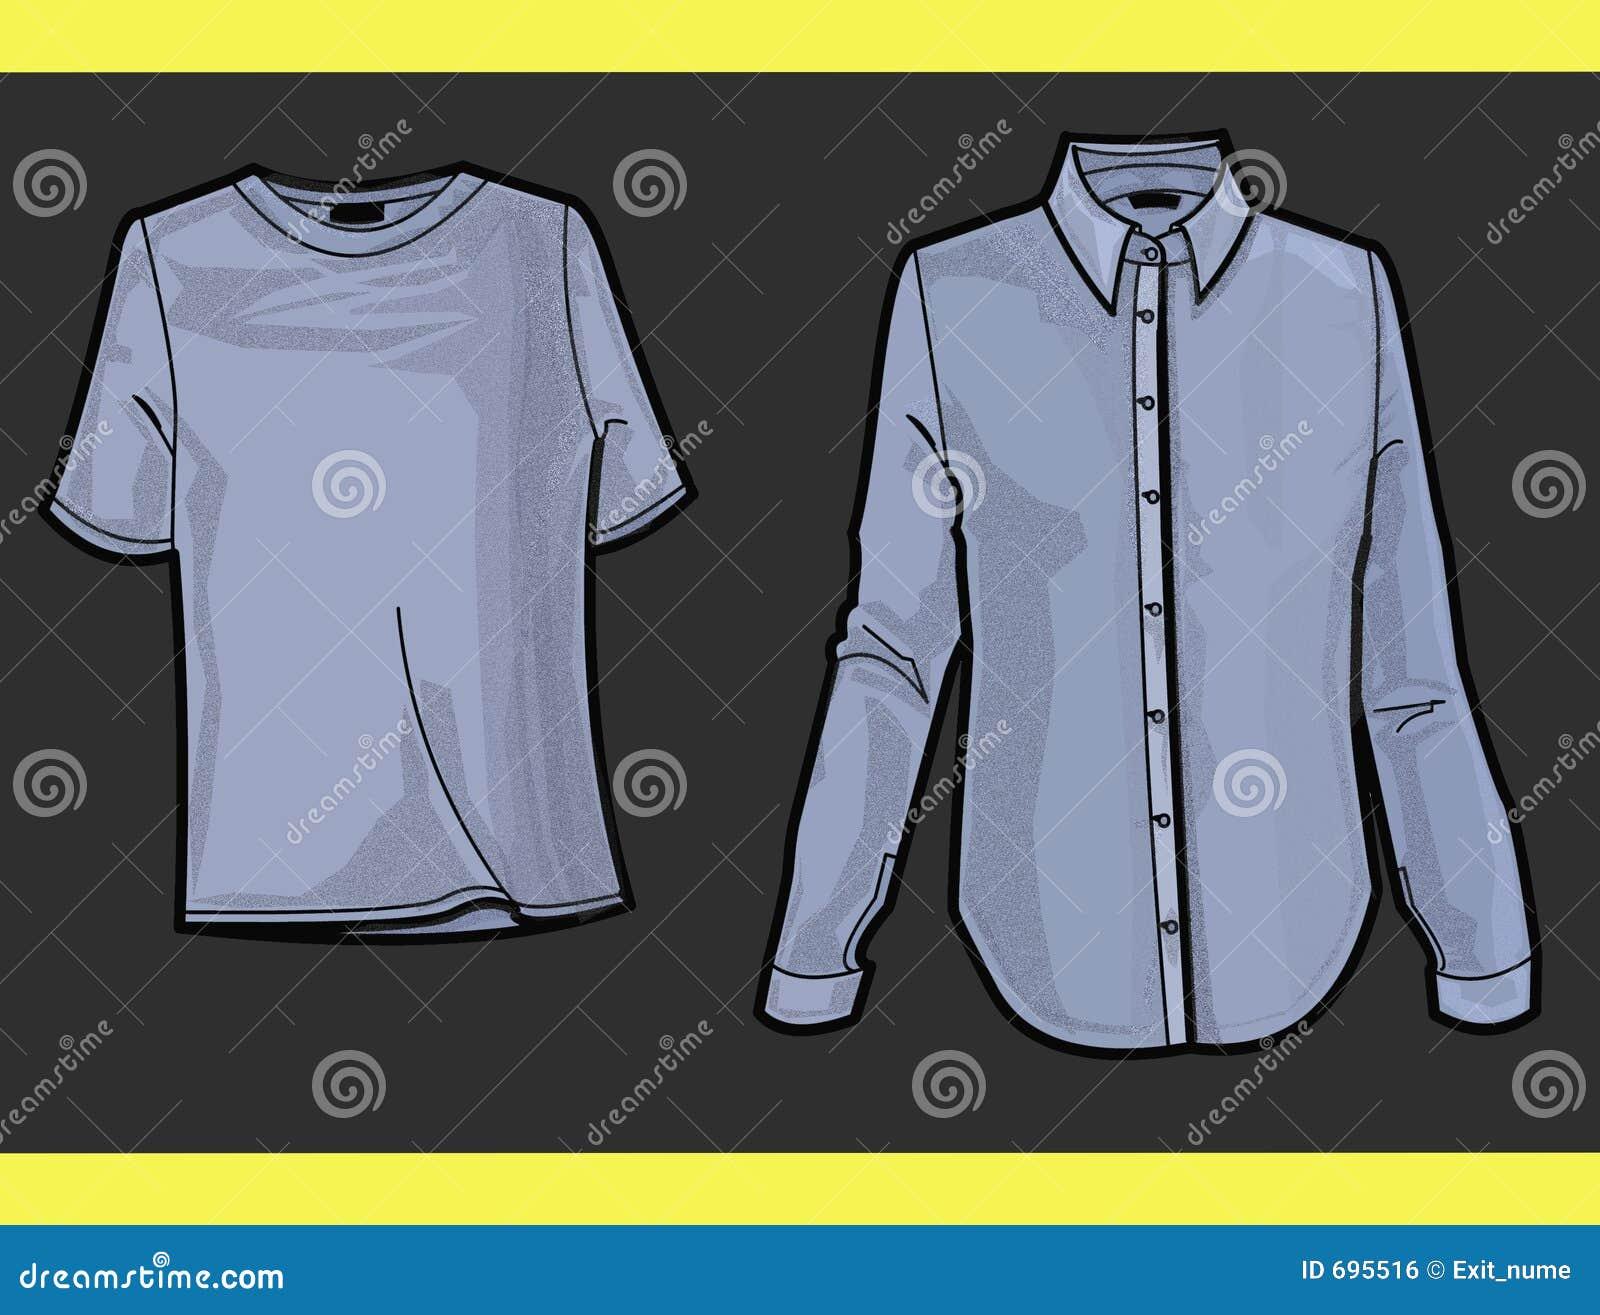 2017 mujer moda T Camisas manga corta 100% algodón